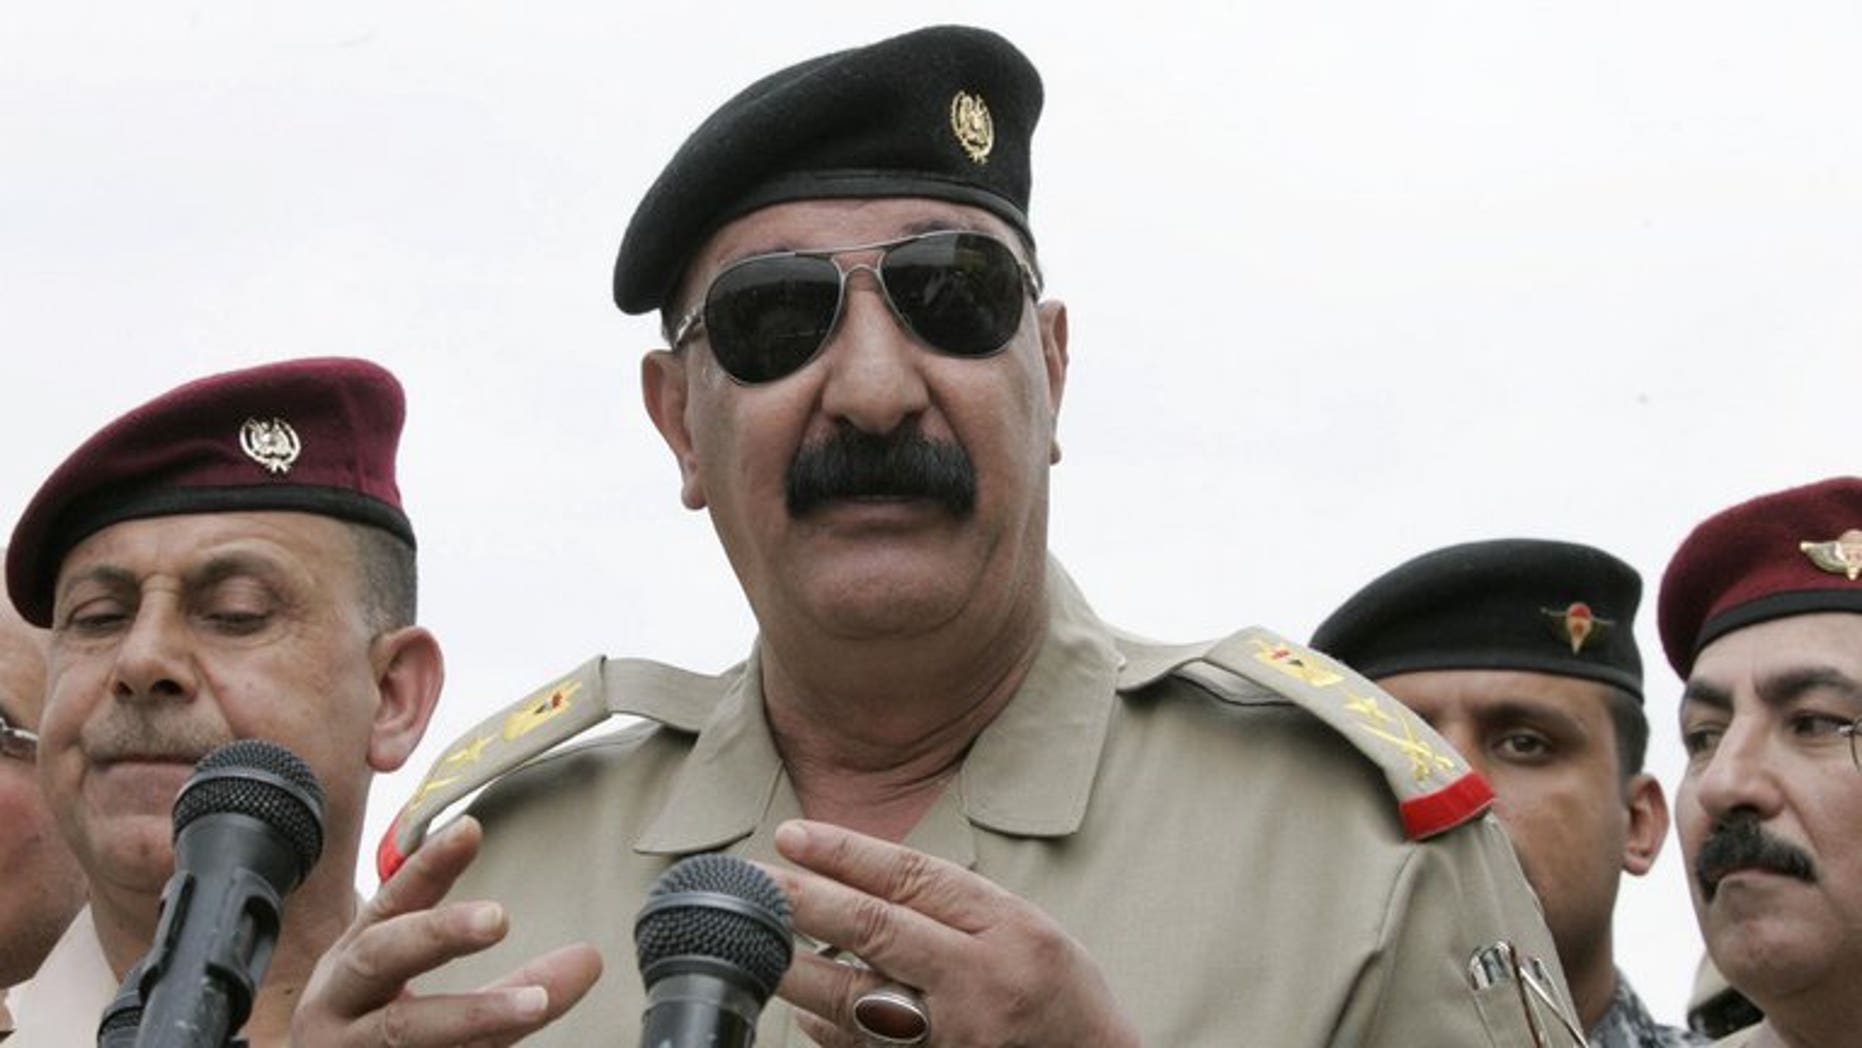 Iraqi Staff Lieutenant General Abdulamir al-Zaidi addresses troops in Kirkuk on October 21, 2012. Zaidi said he survived a bombing on Saturday that killed nine soldiers during an operation against Al-Qaeda militants in Diyala province north of Baghdad.